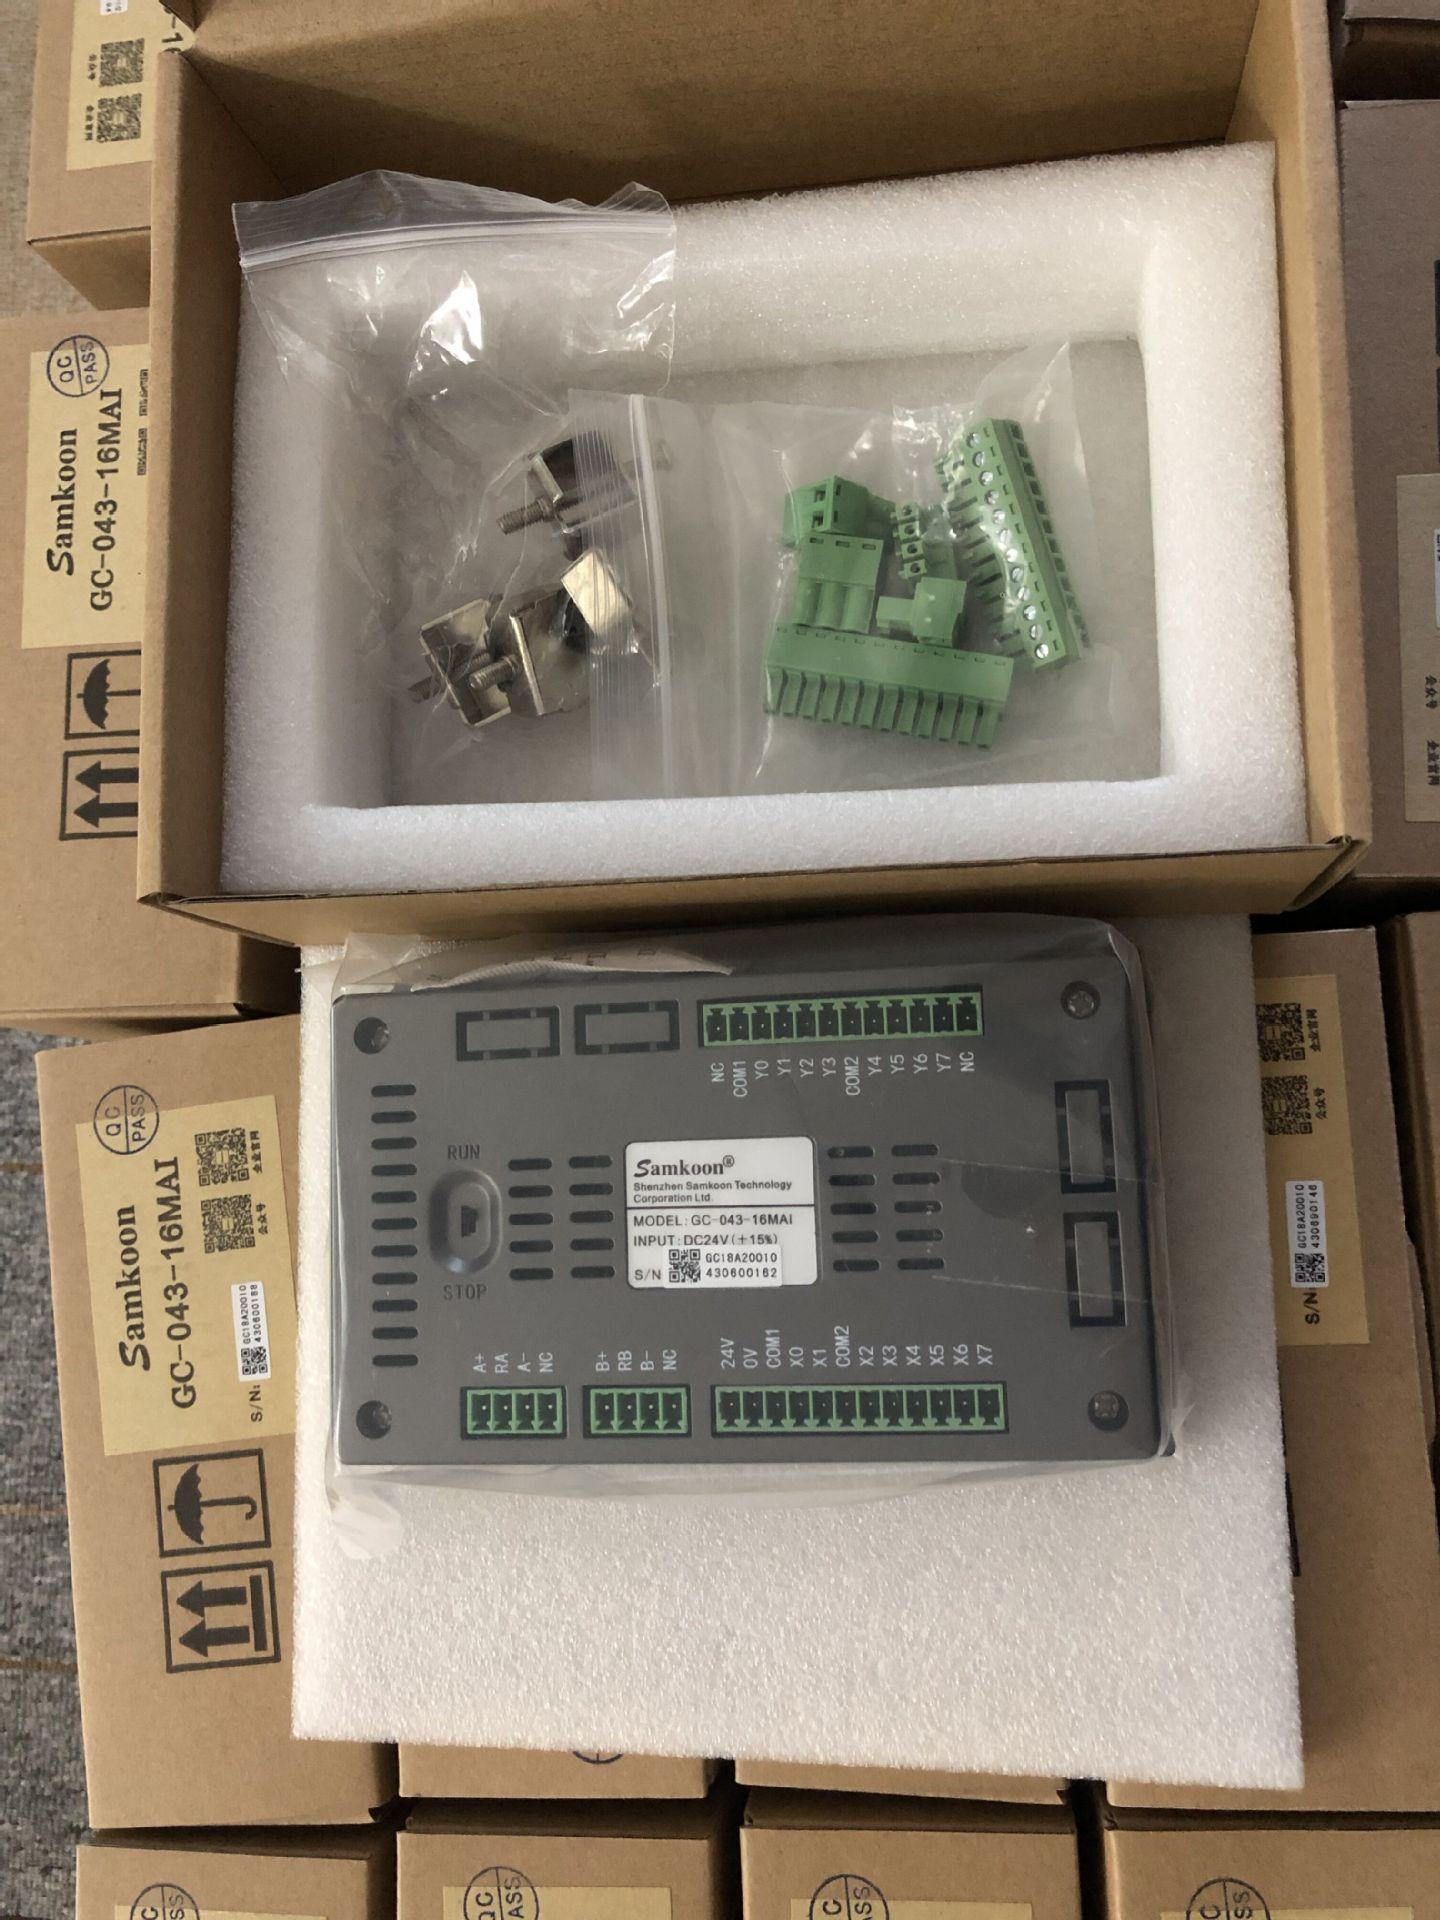 GC-043-16MAI 深圳Samkoon显控GC系列一体机 带模拟量输入